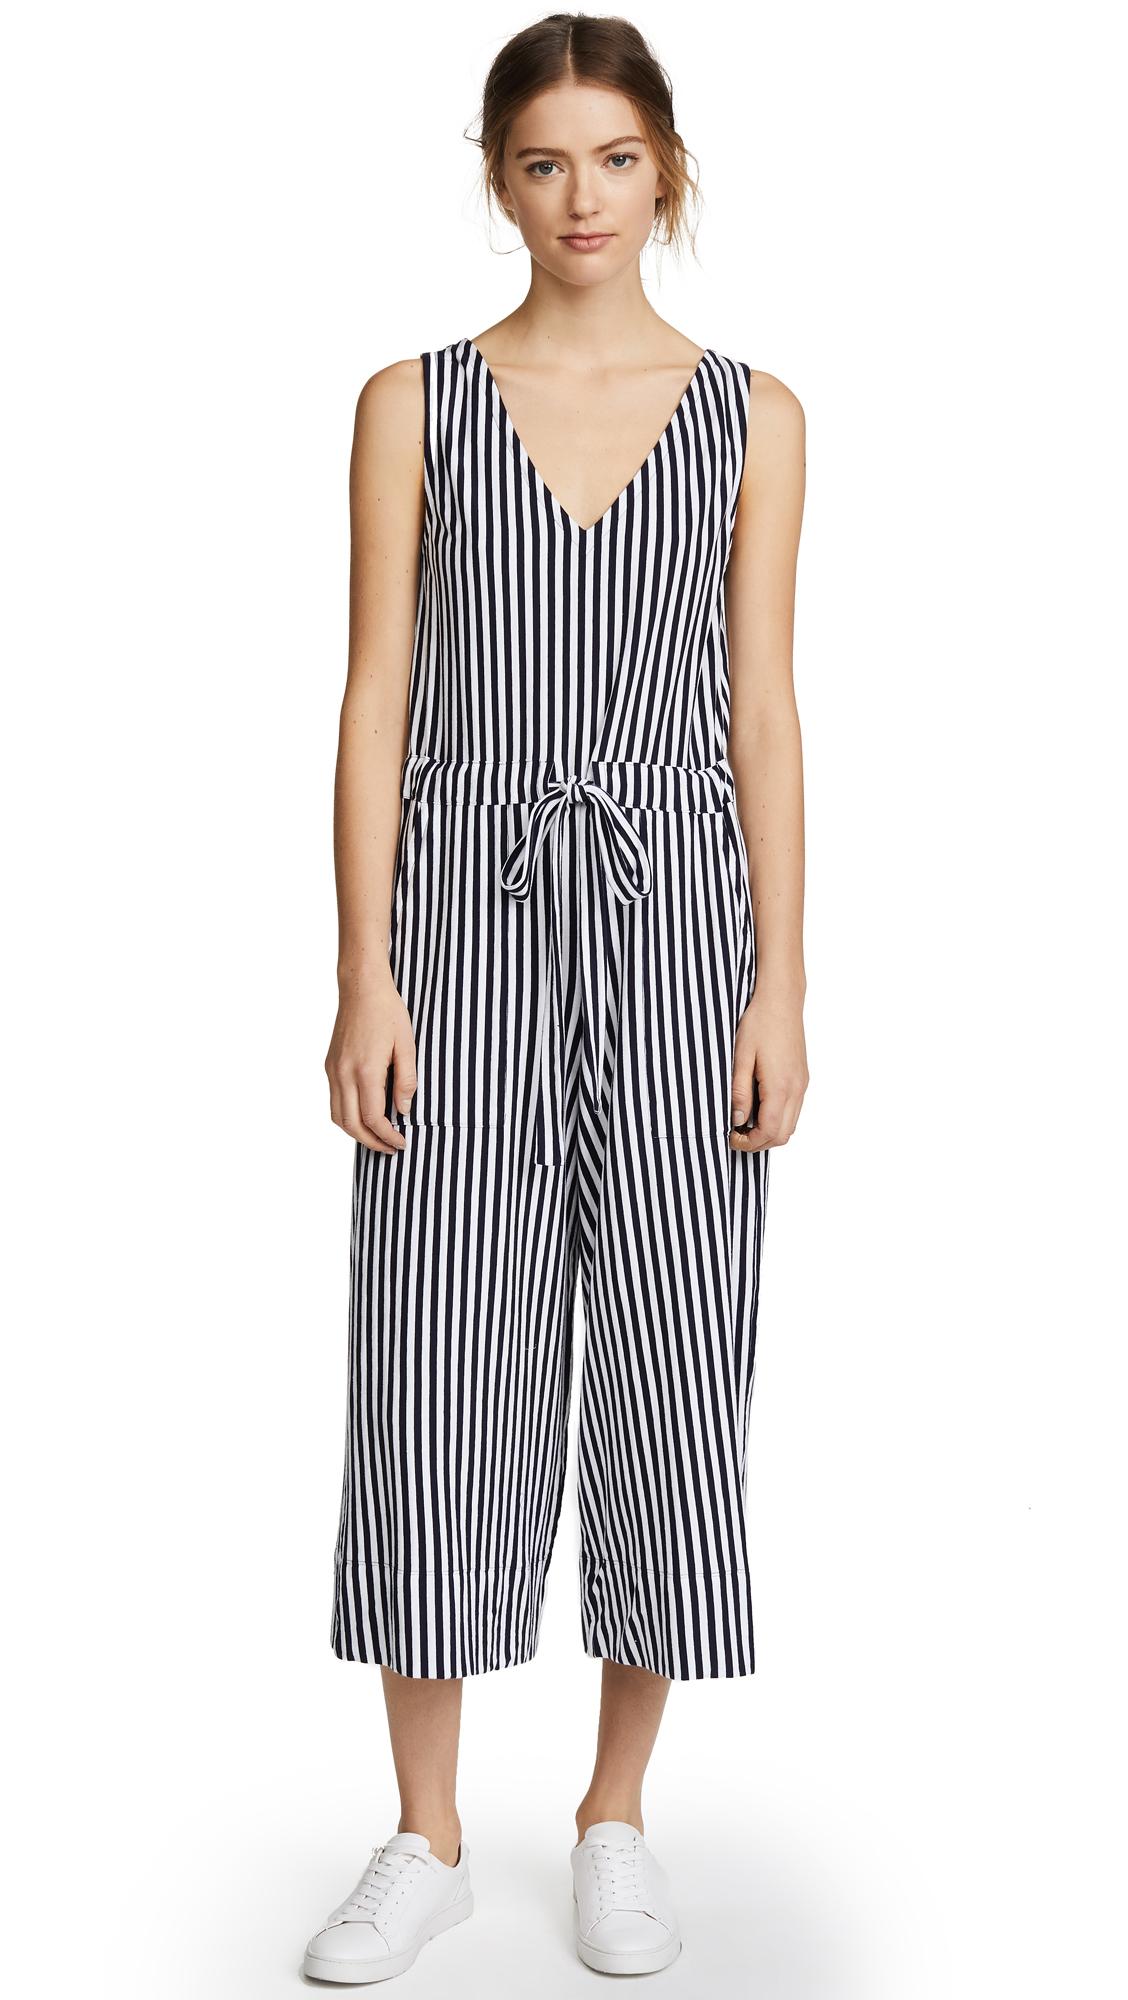 MDS Stripes Amanda Jumpsuit - Navy Stripe